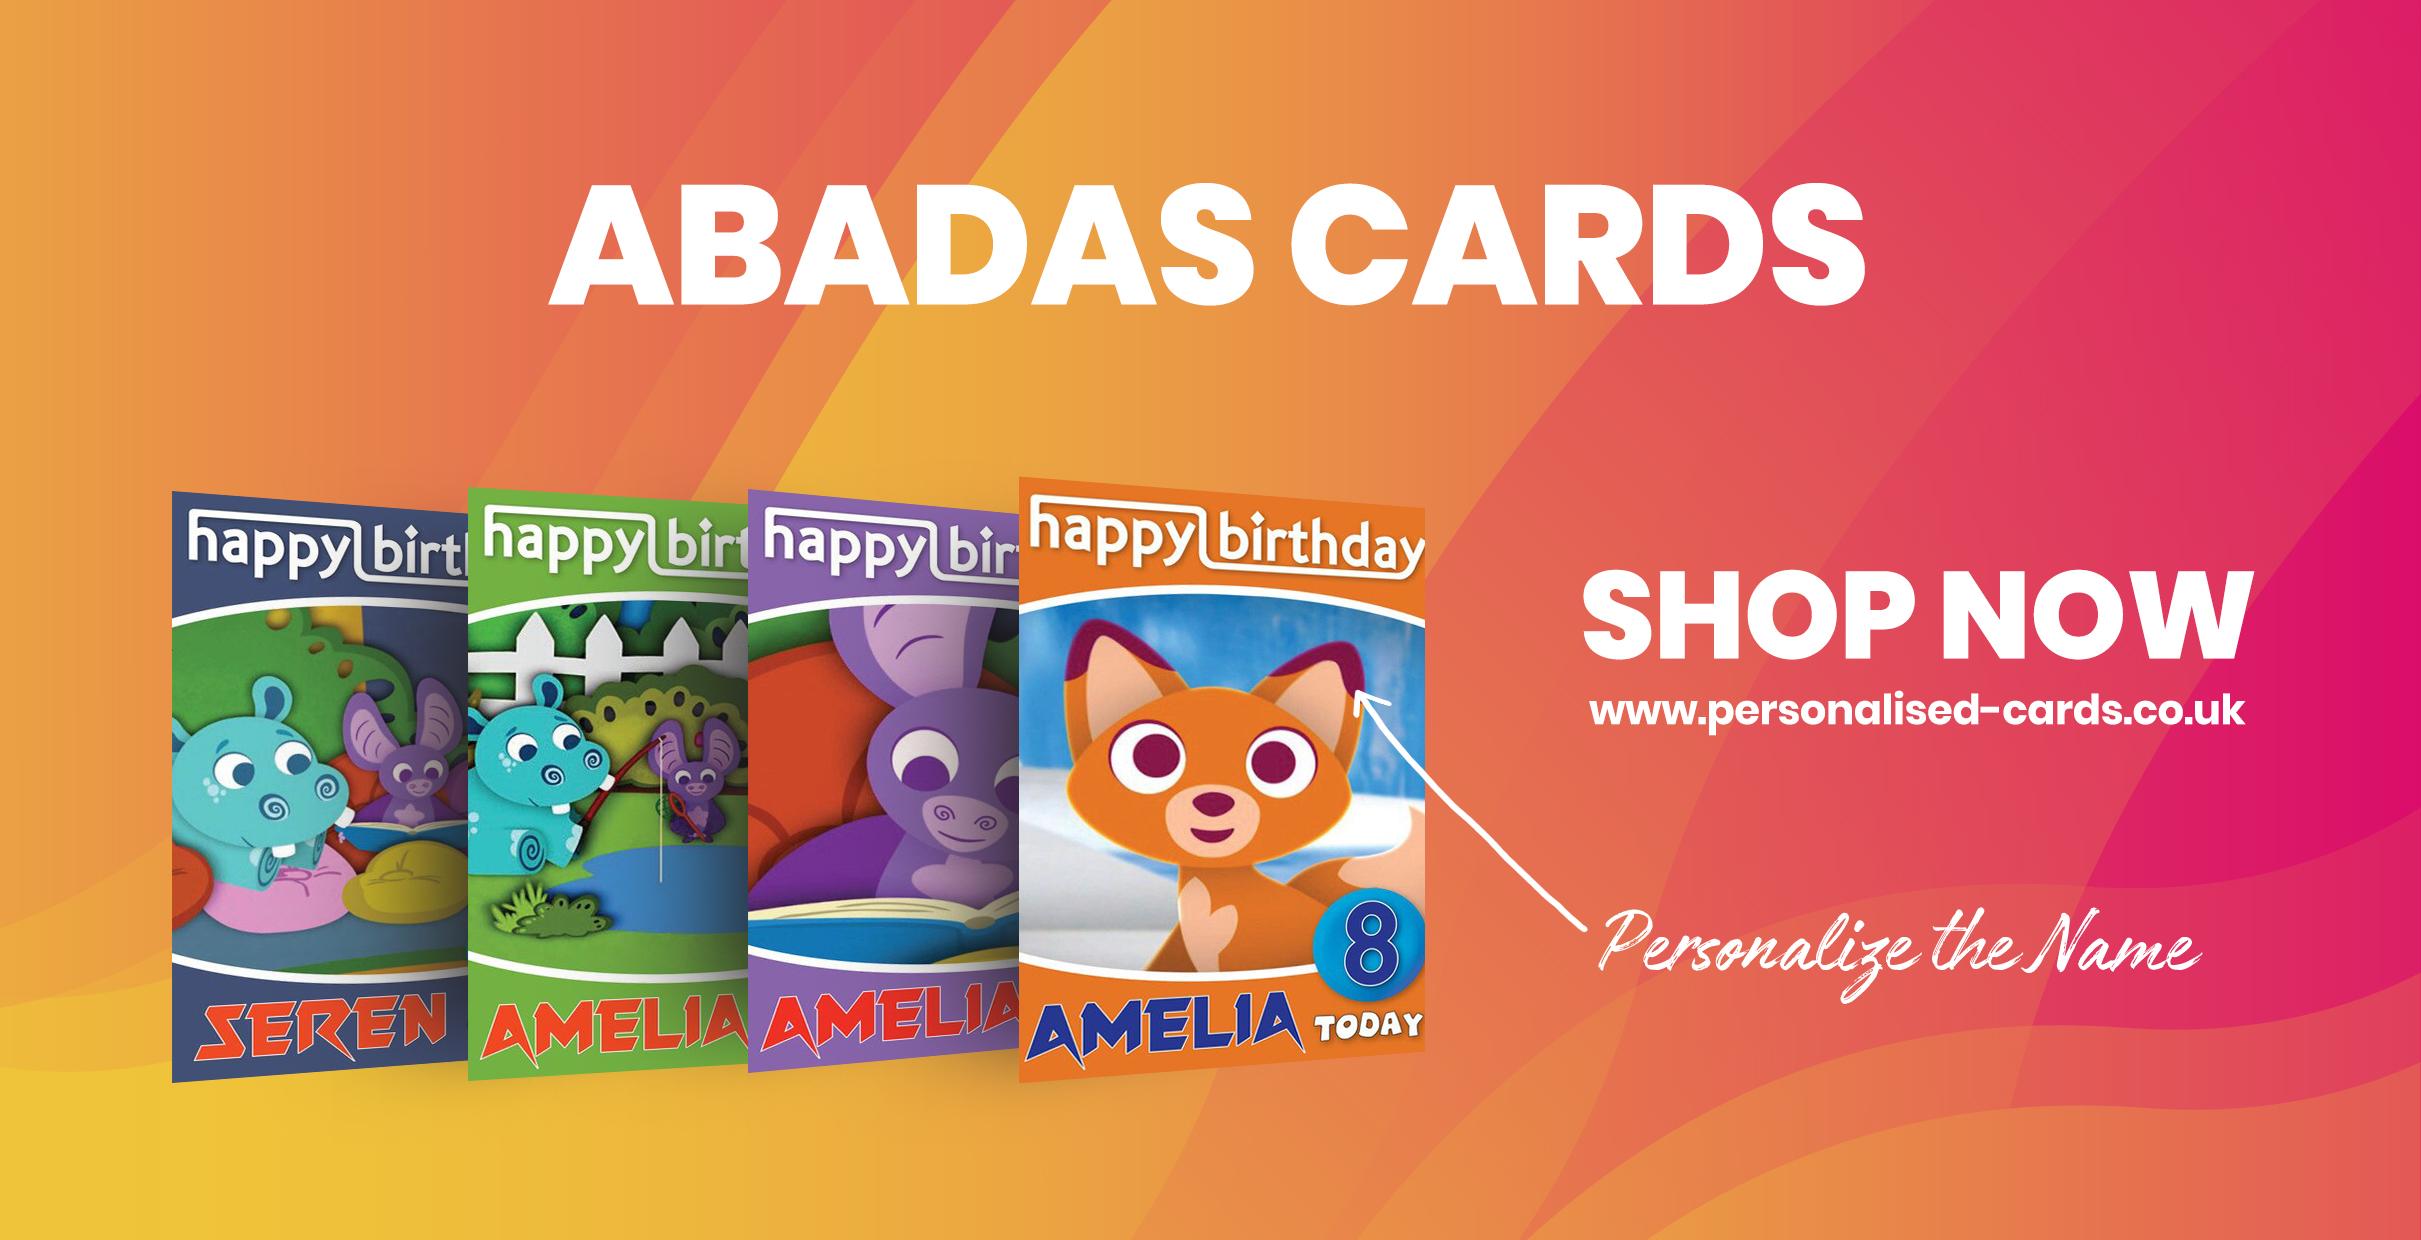 abadas-cards.jpg